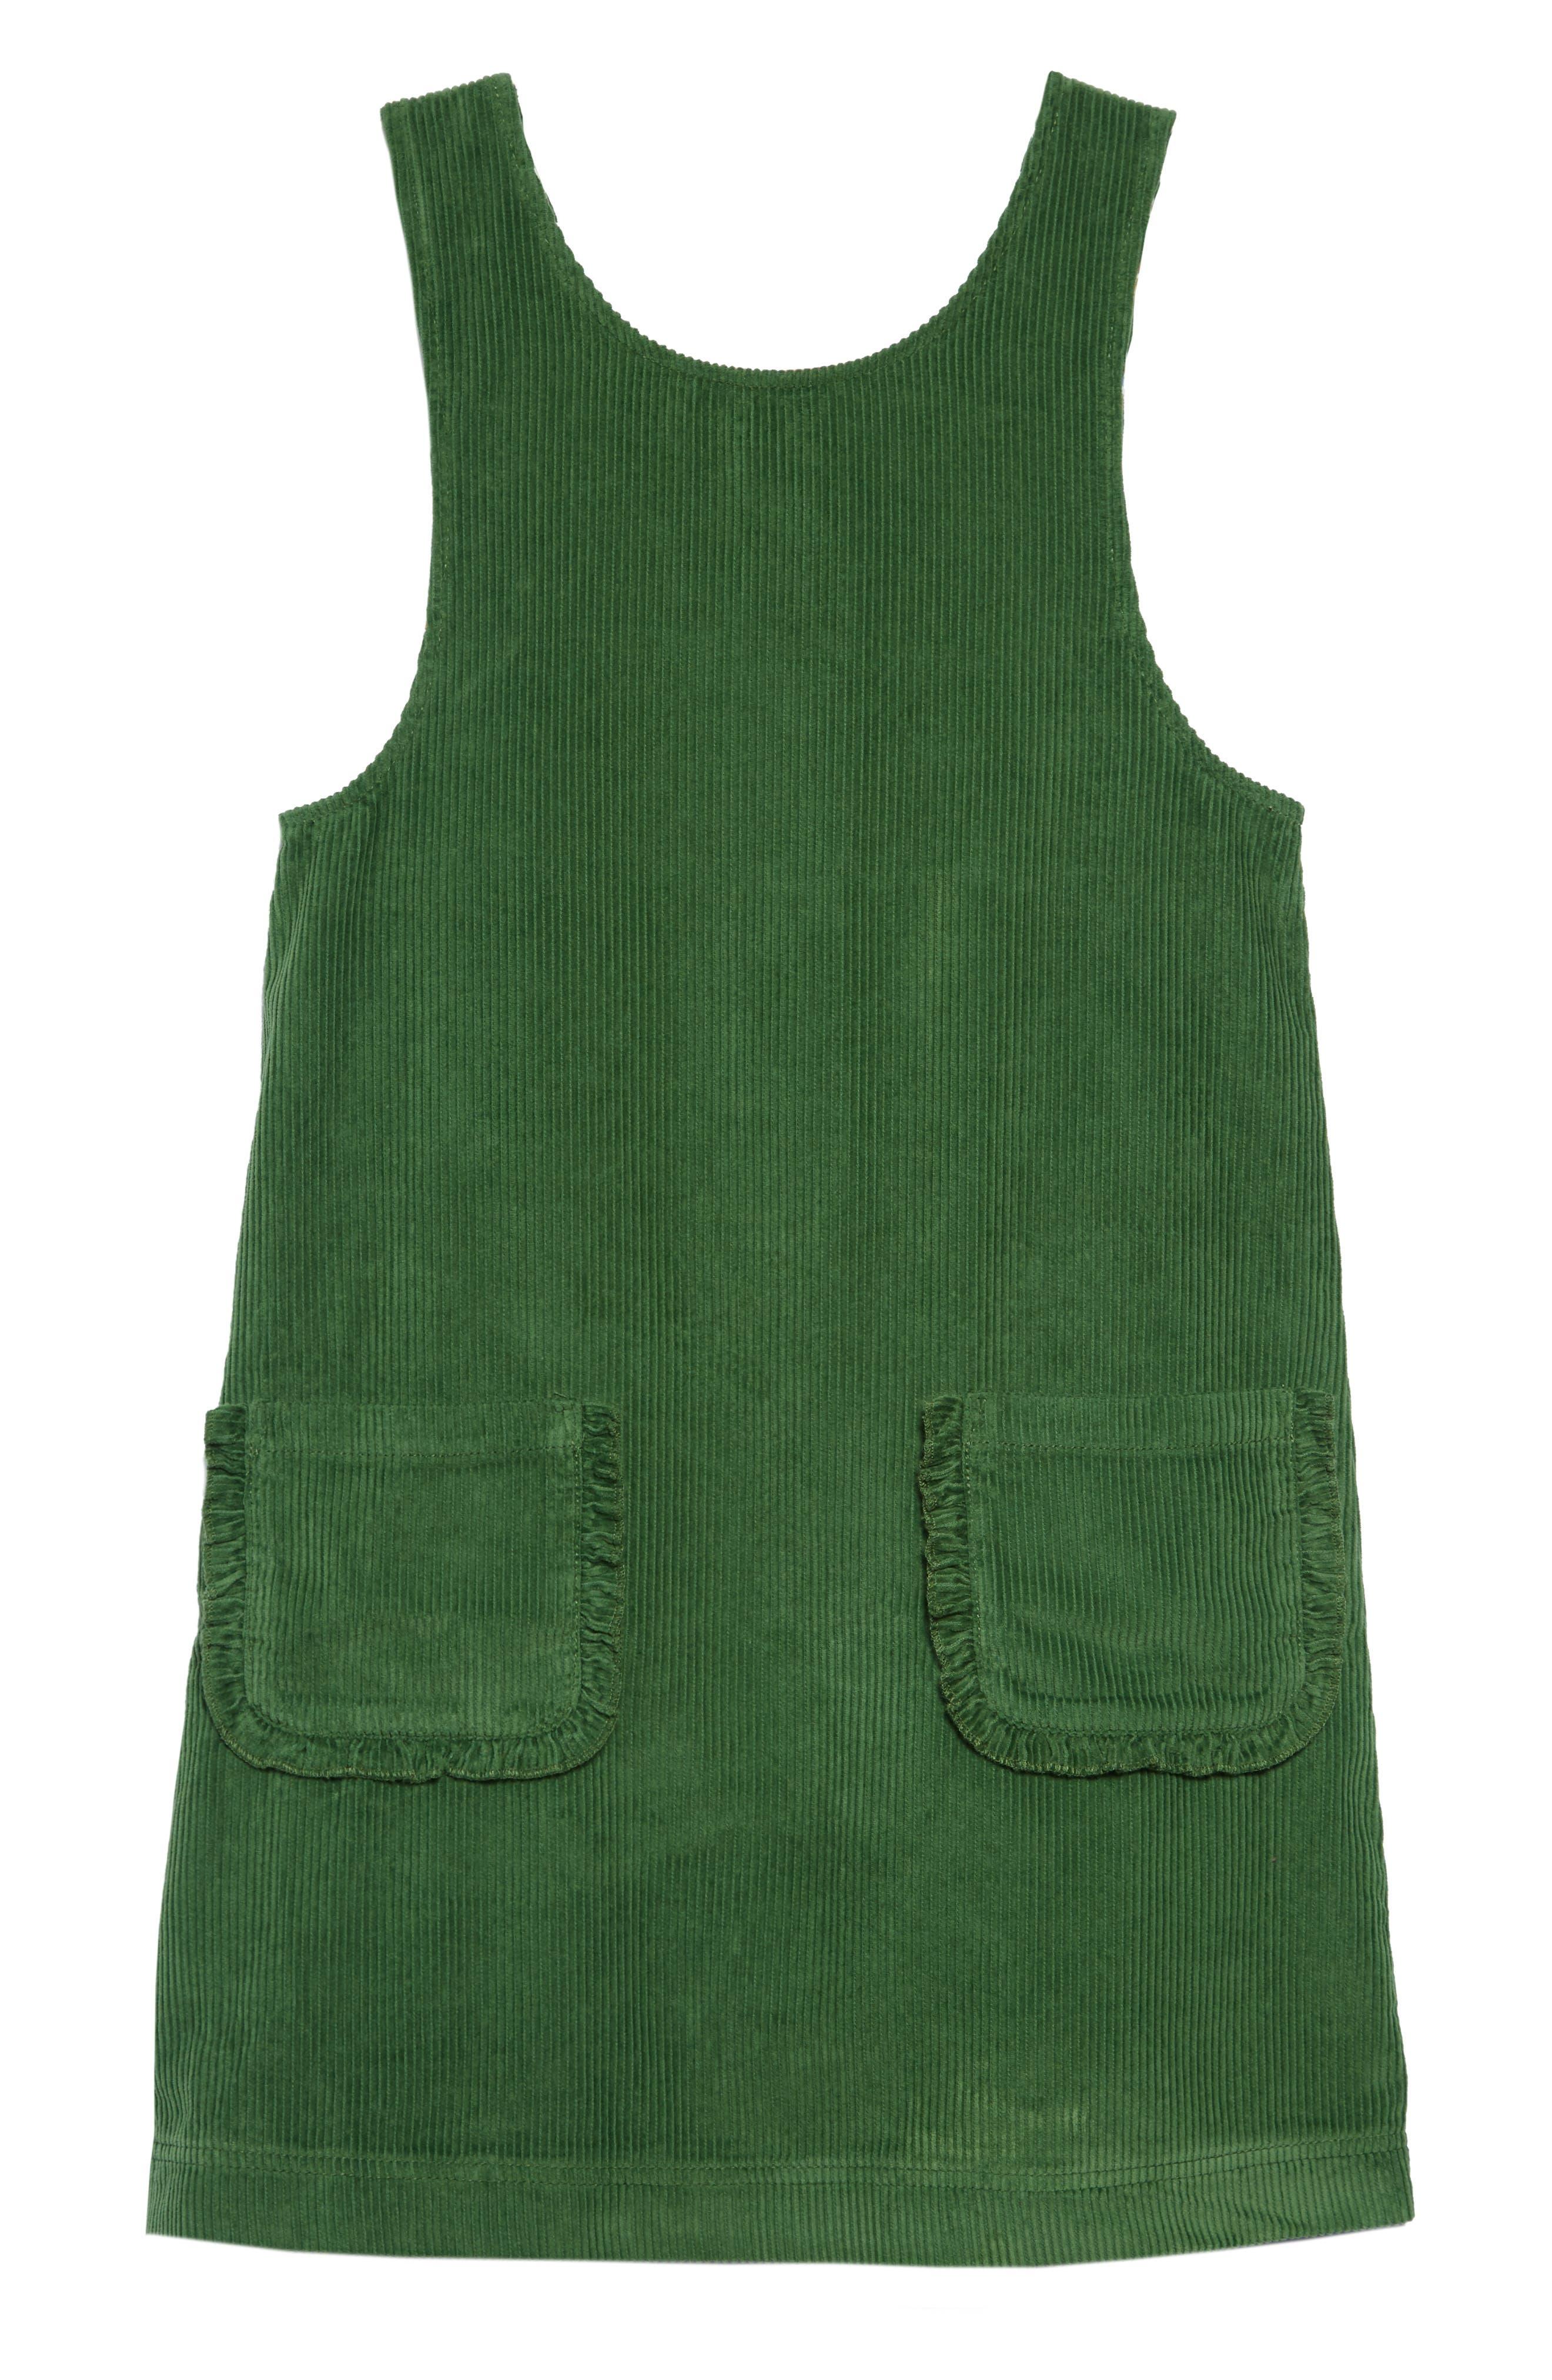 60s 70s Kids Costumes & Clothing Girls & Boys Toddler Girls Mini Boden Pocket Corduroy Pinafore Dress Size 3-4Y - Green $45.00 AT vintagedancer.com